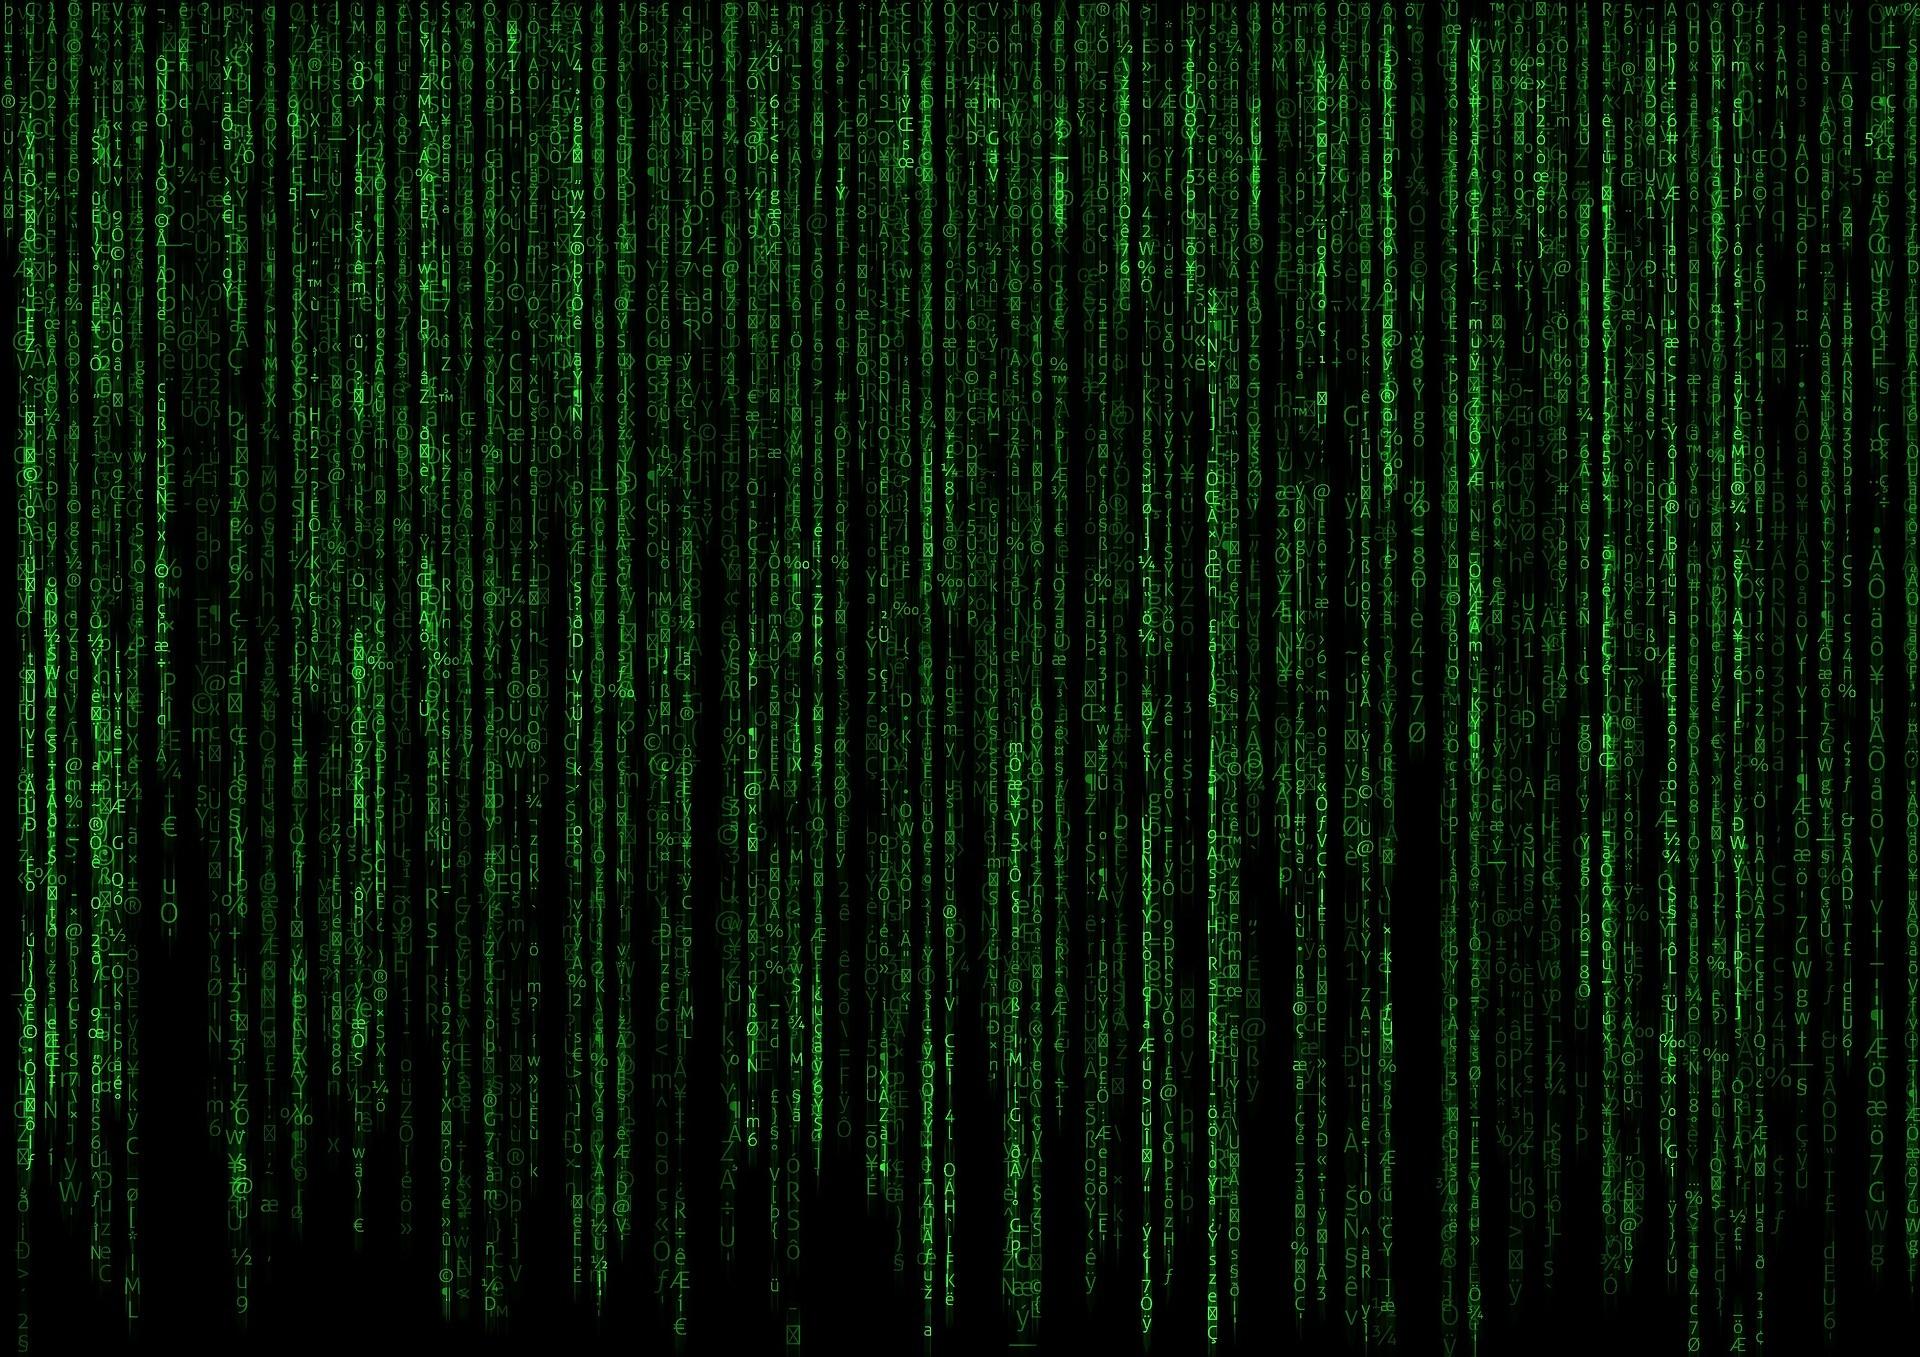 Image of matrix coding on black screen